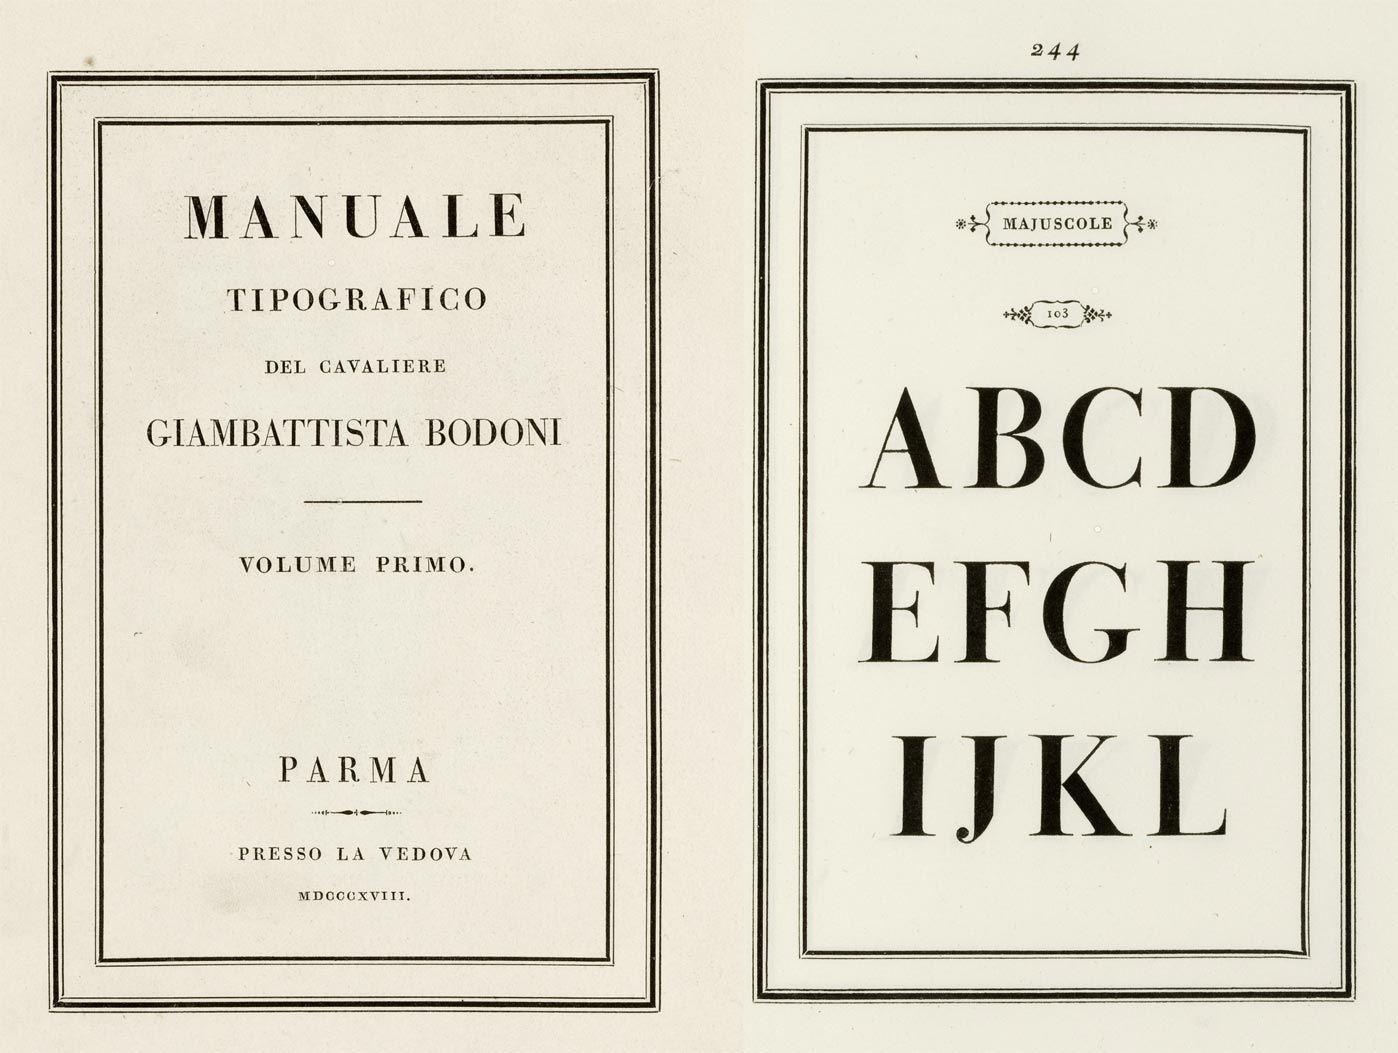 Manuale Tipografico - Giambattista Bodoni